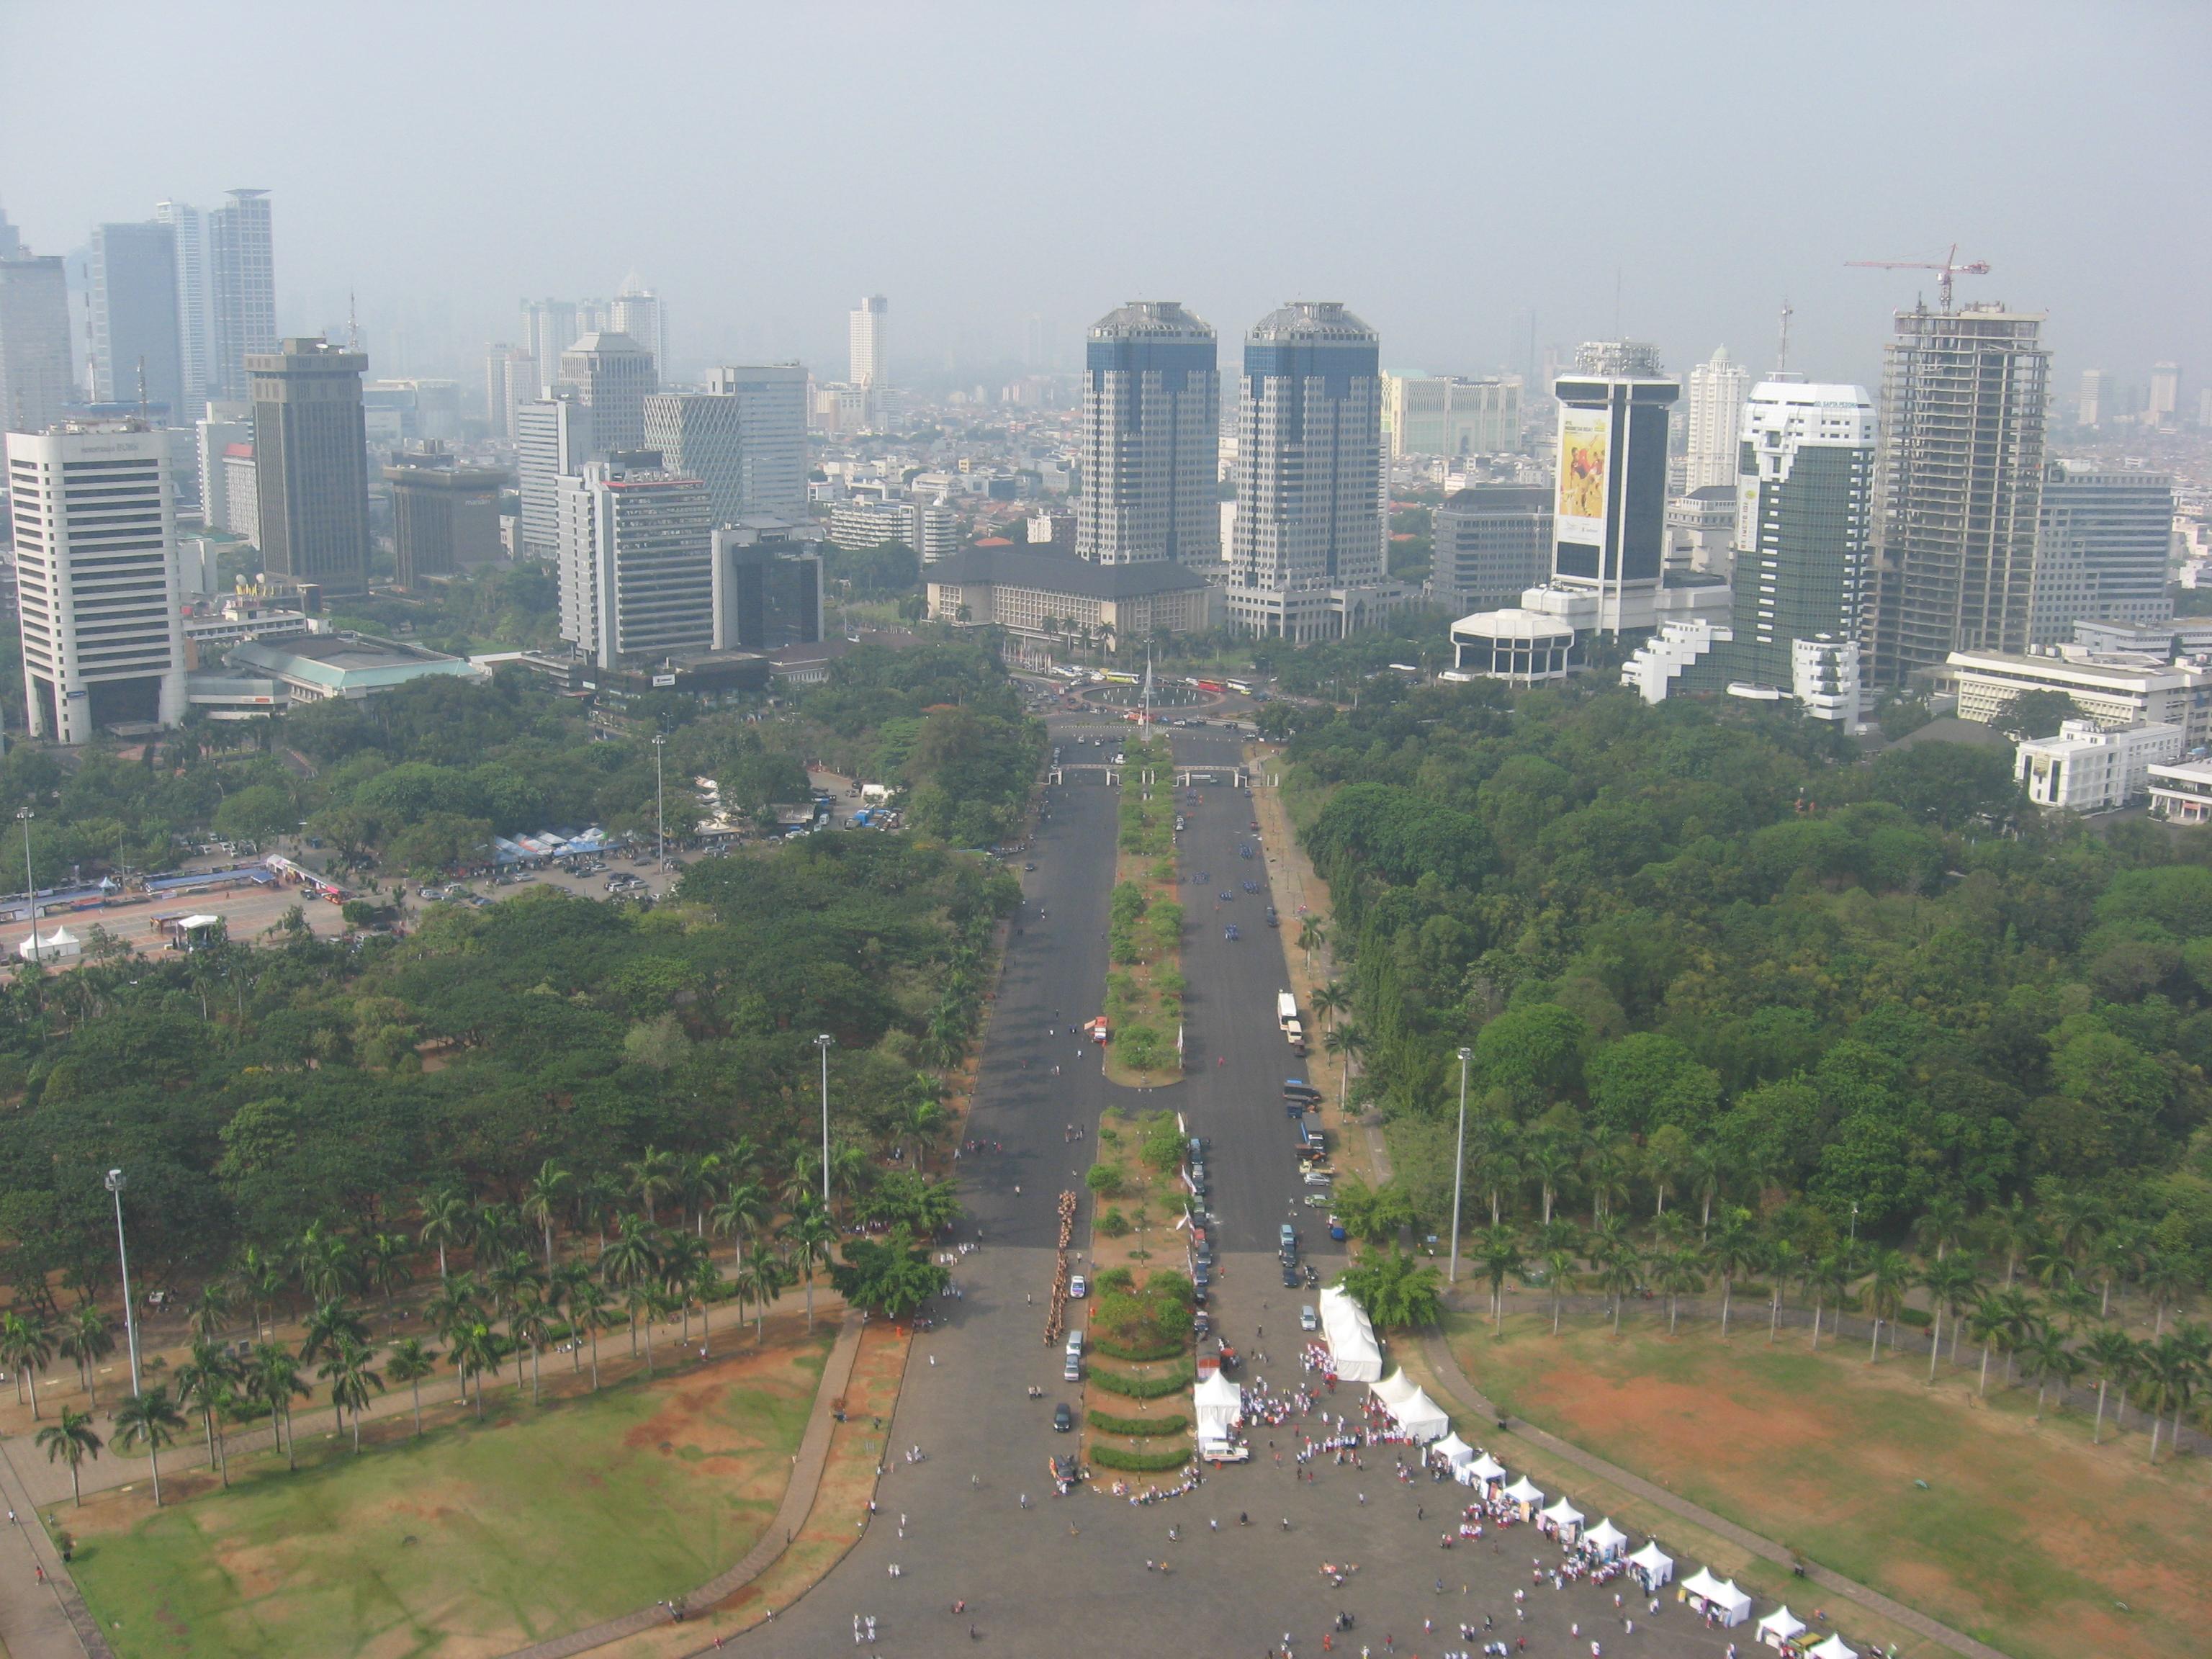 Monas Jakarta Wallpaper File:view of Jakarta From